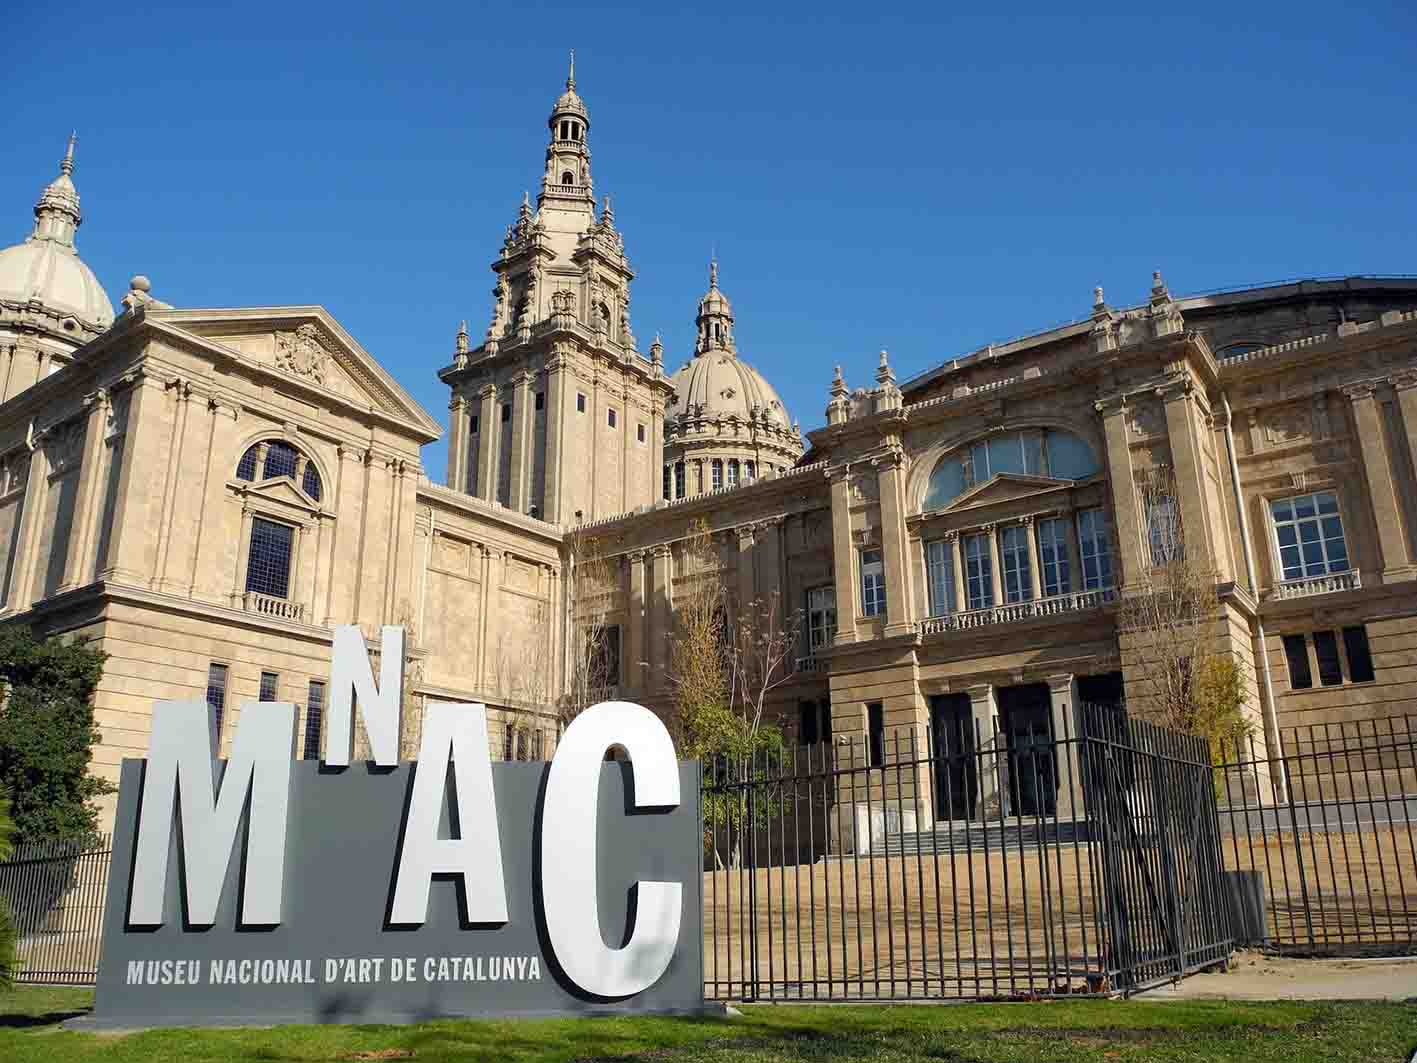 barcelona-mnac-museu-nacional-dart-de-catalunya5